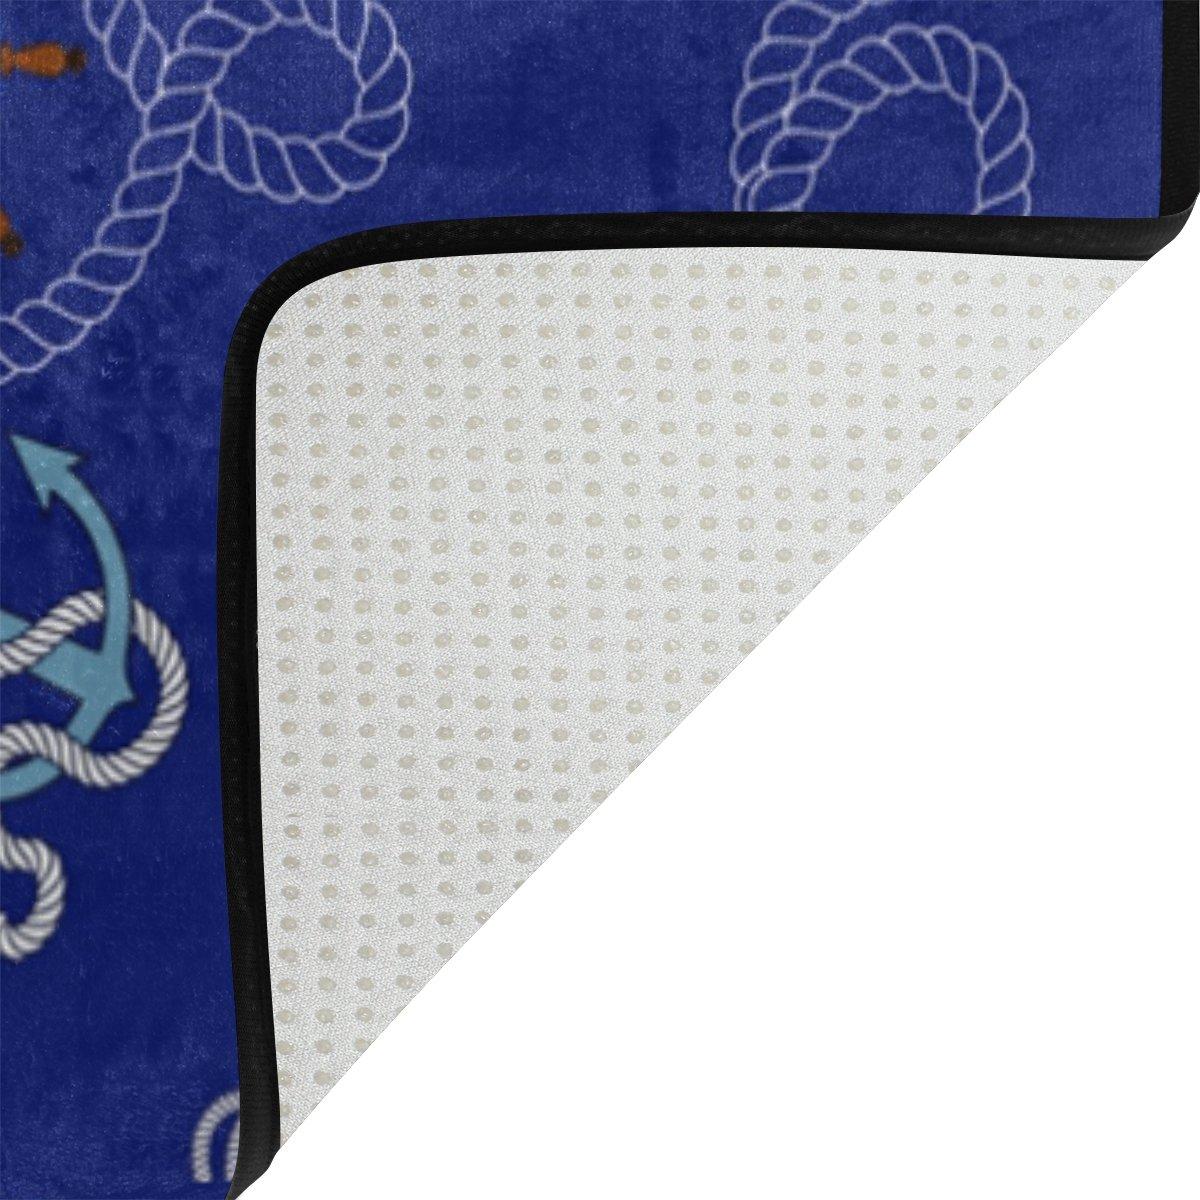 Amazon.com: lorvies azul marino estampado náutico anclajes ...